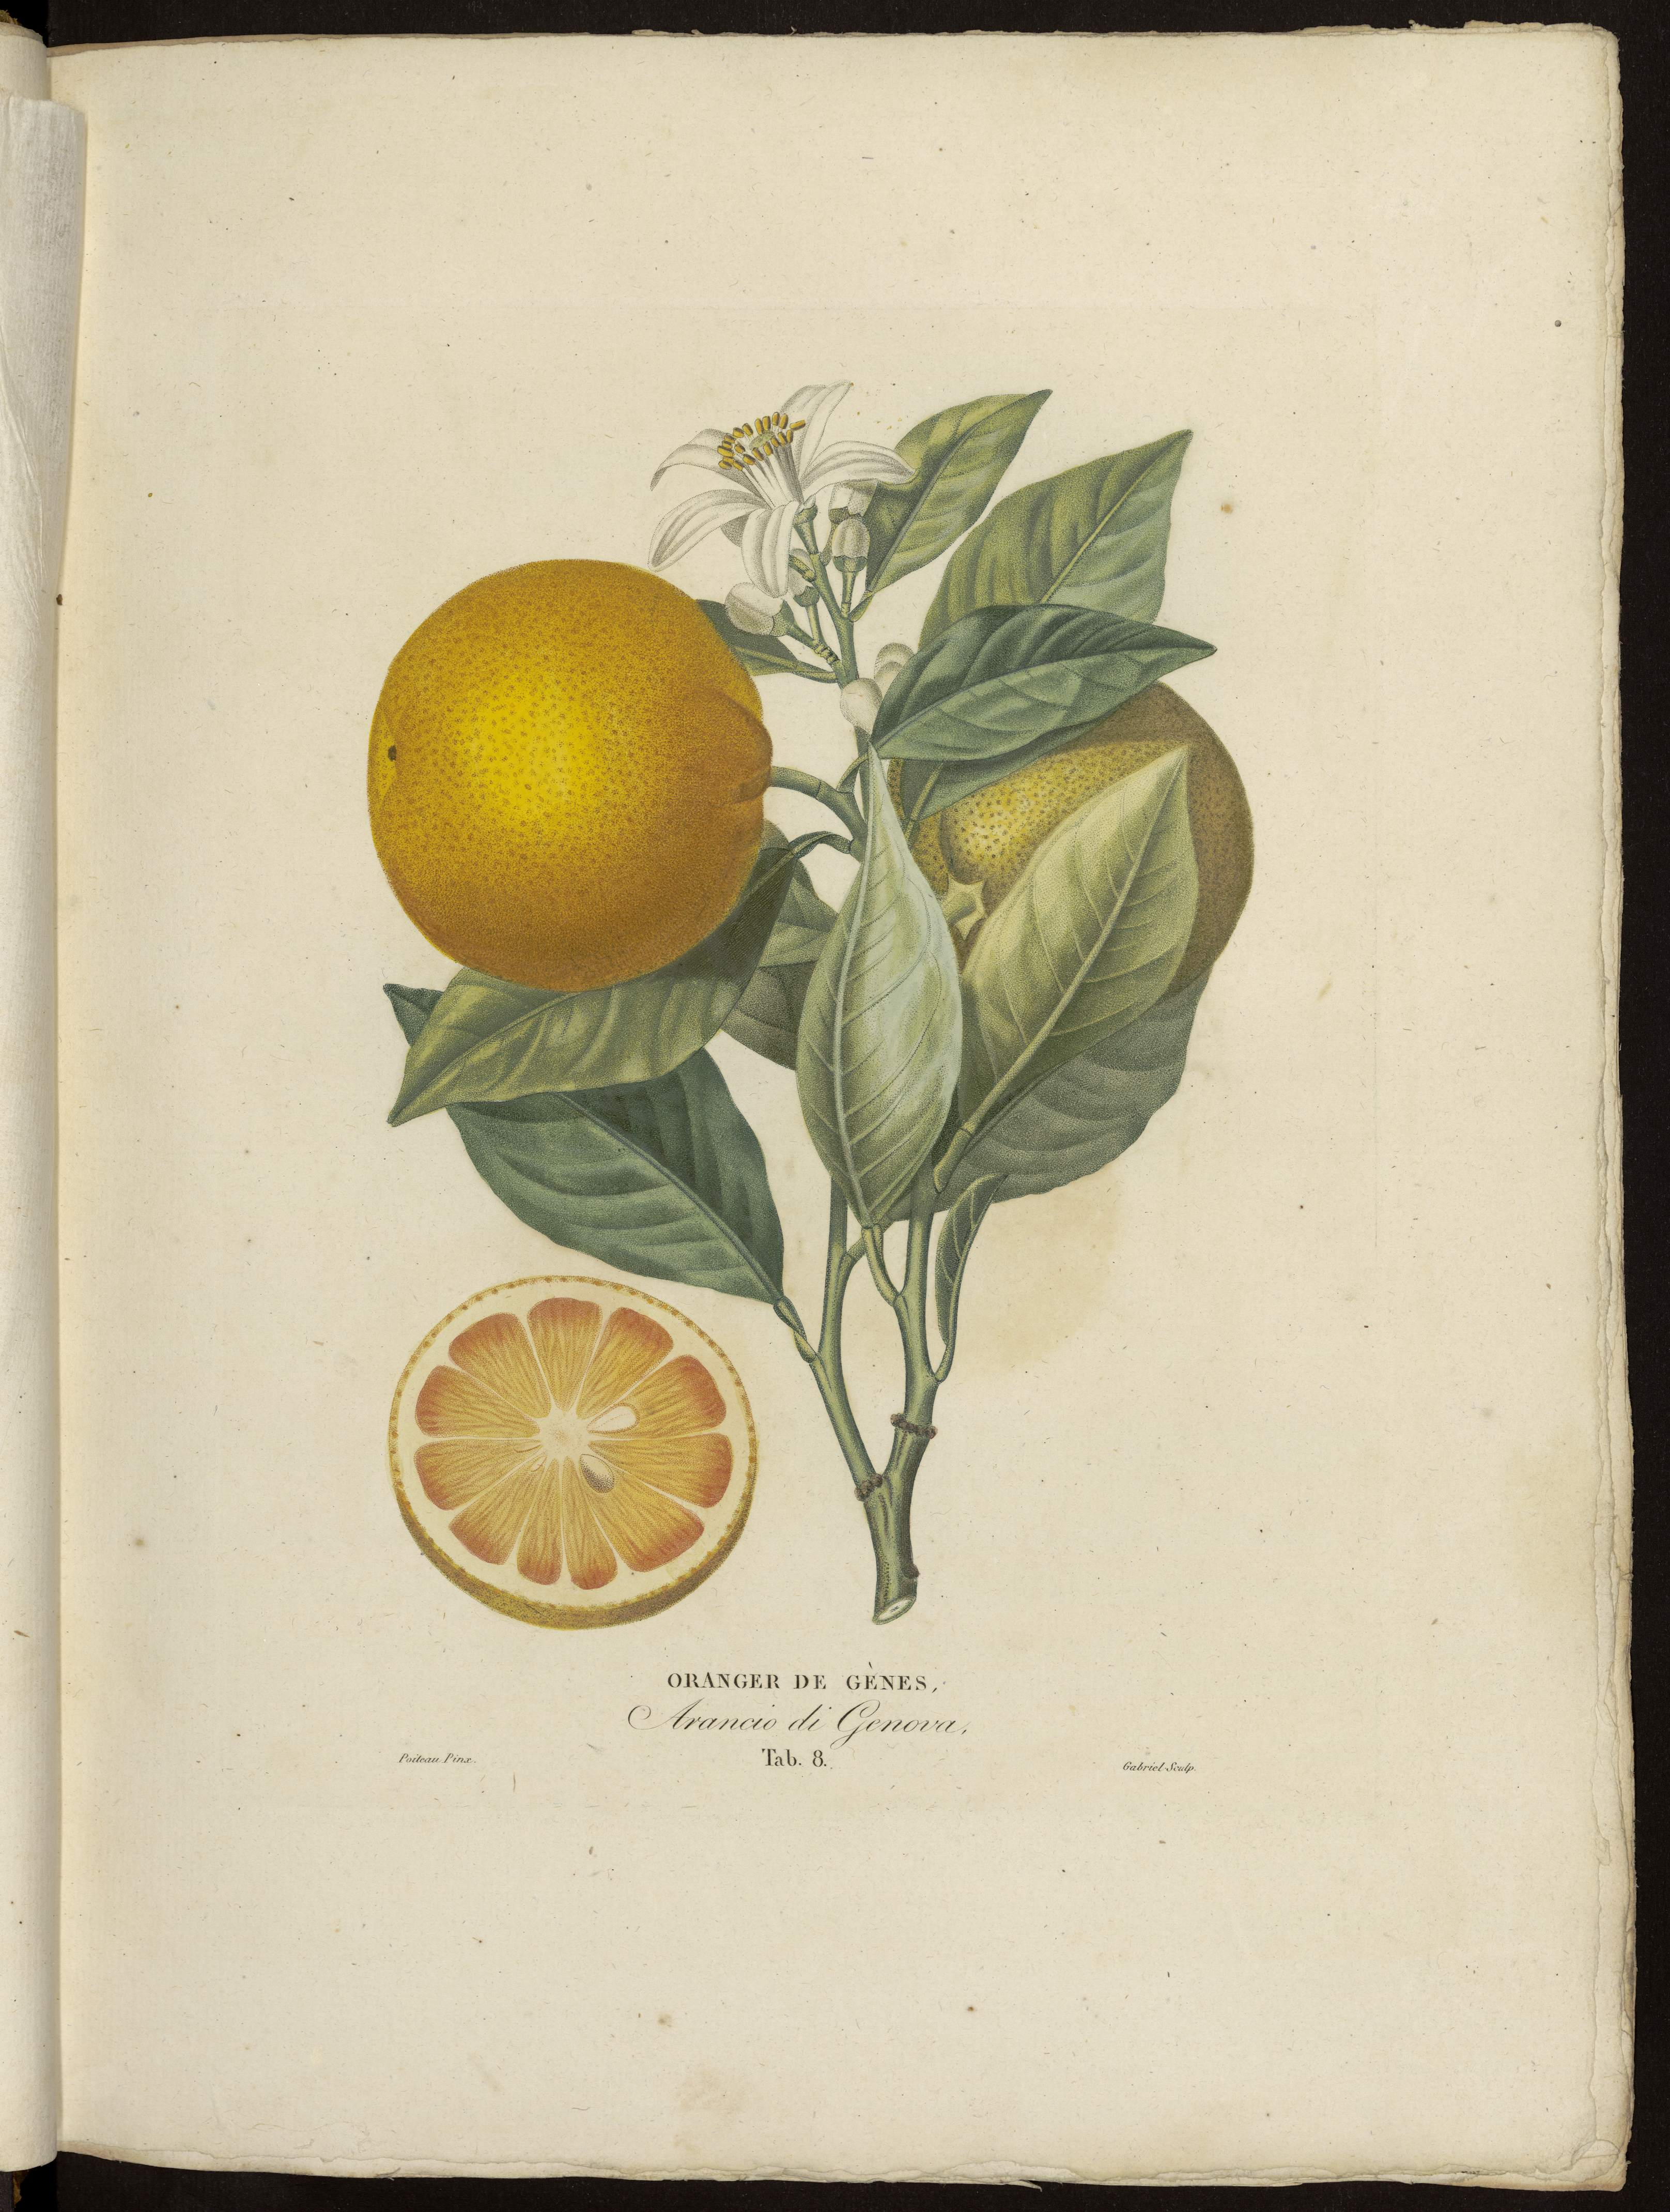 Oranger de Gènes